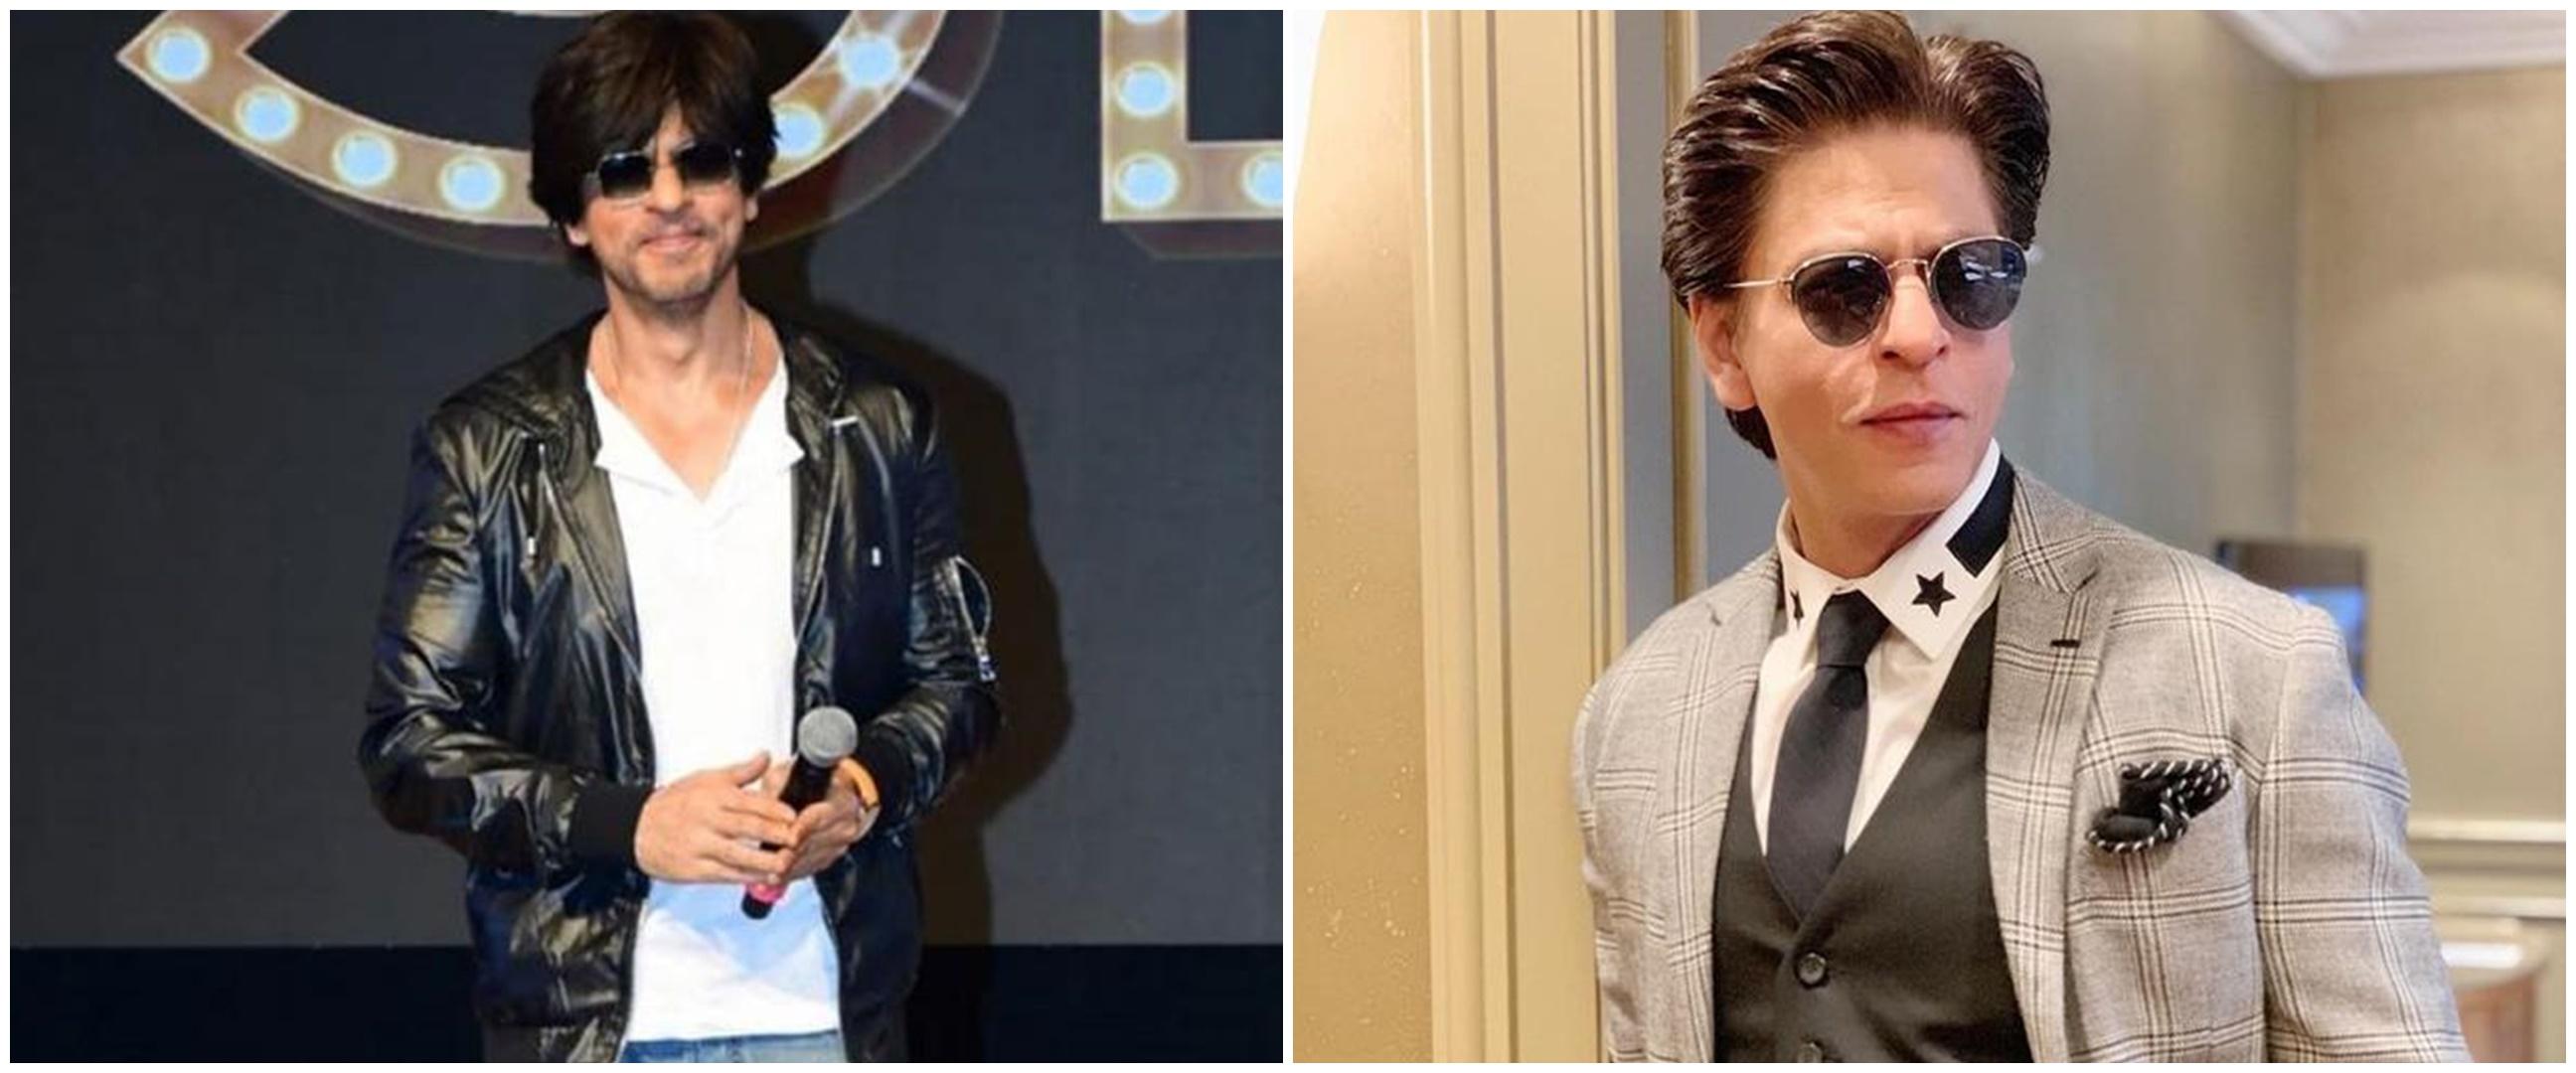 8 Potret ini bukti Shah Rukh Khan tetap stylish di usia 54 tahun